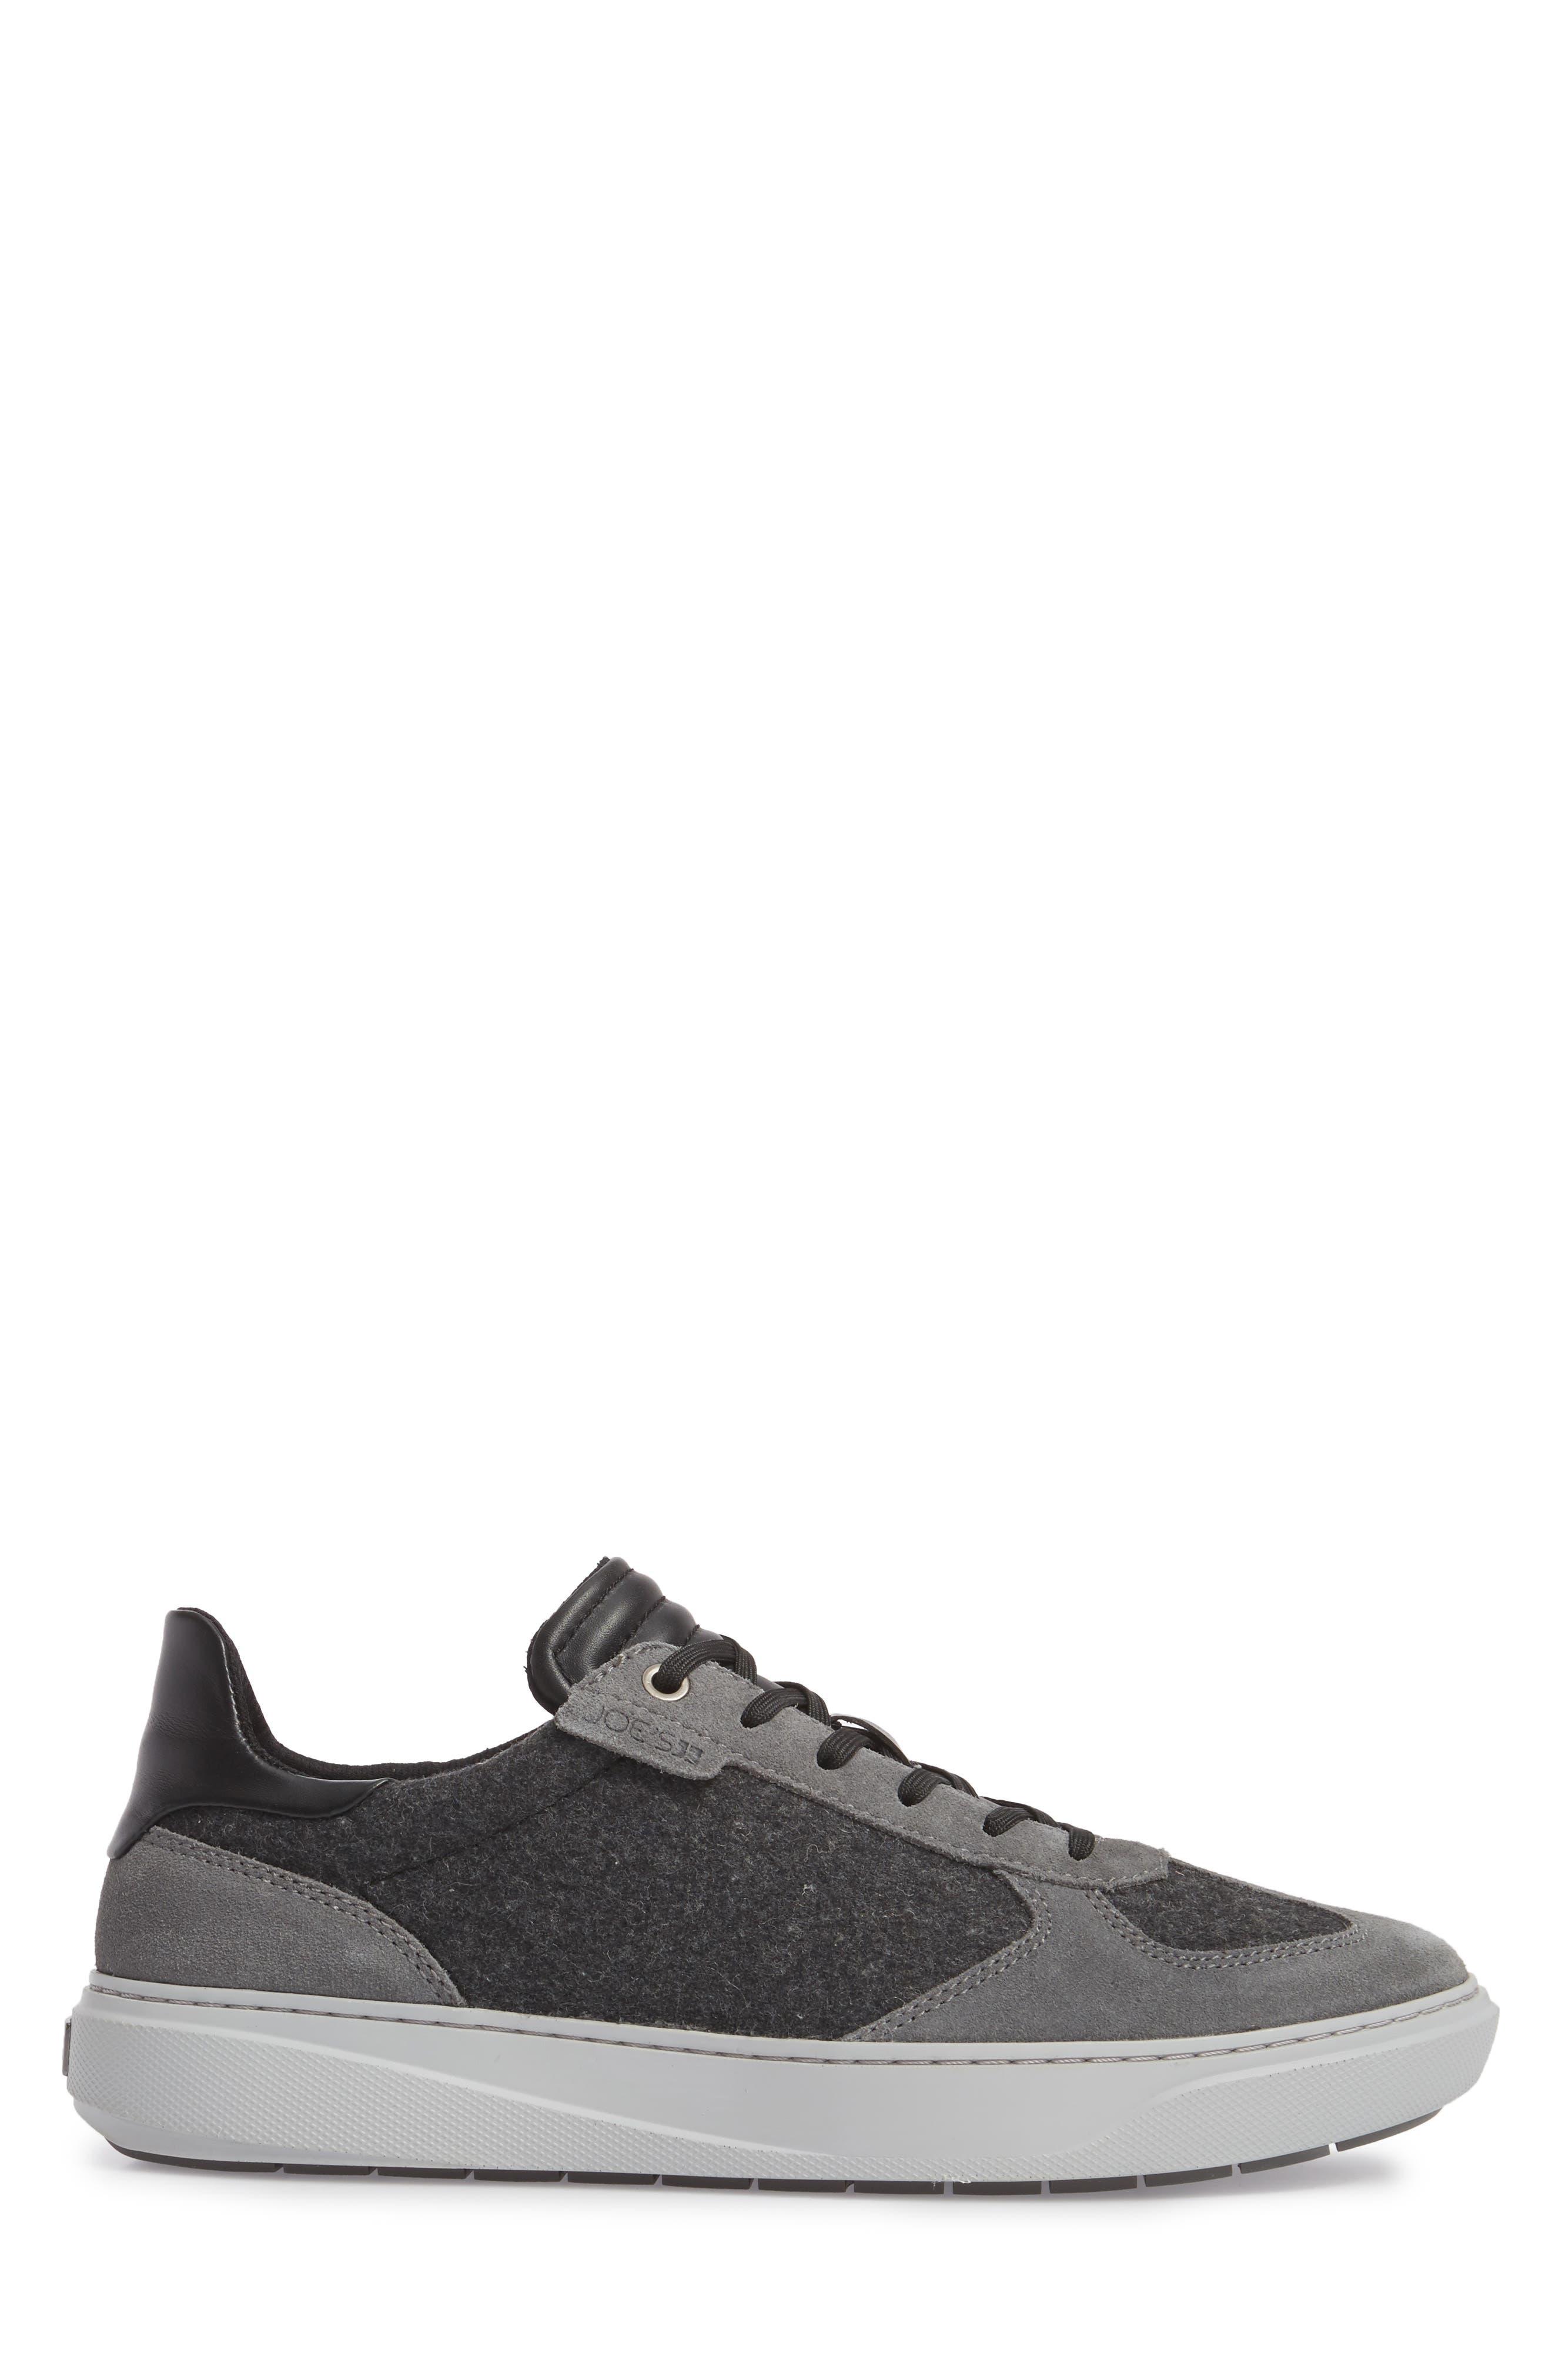 Mo Joe Sneaker,                             Alternate thumbnail 3, color,                             Charcoal Wool/ Suede